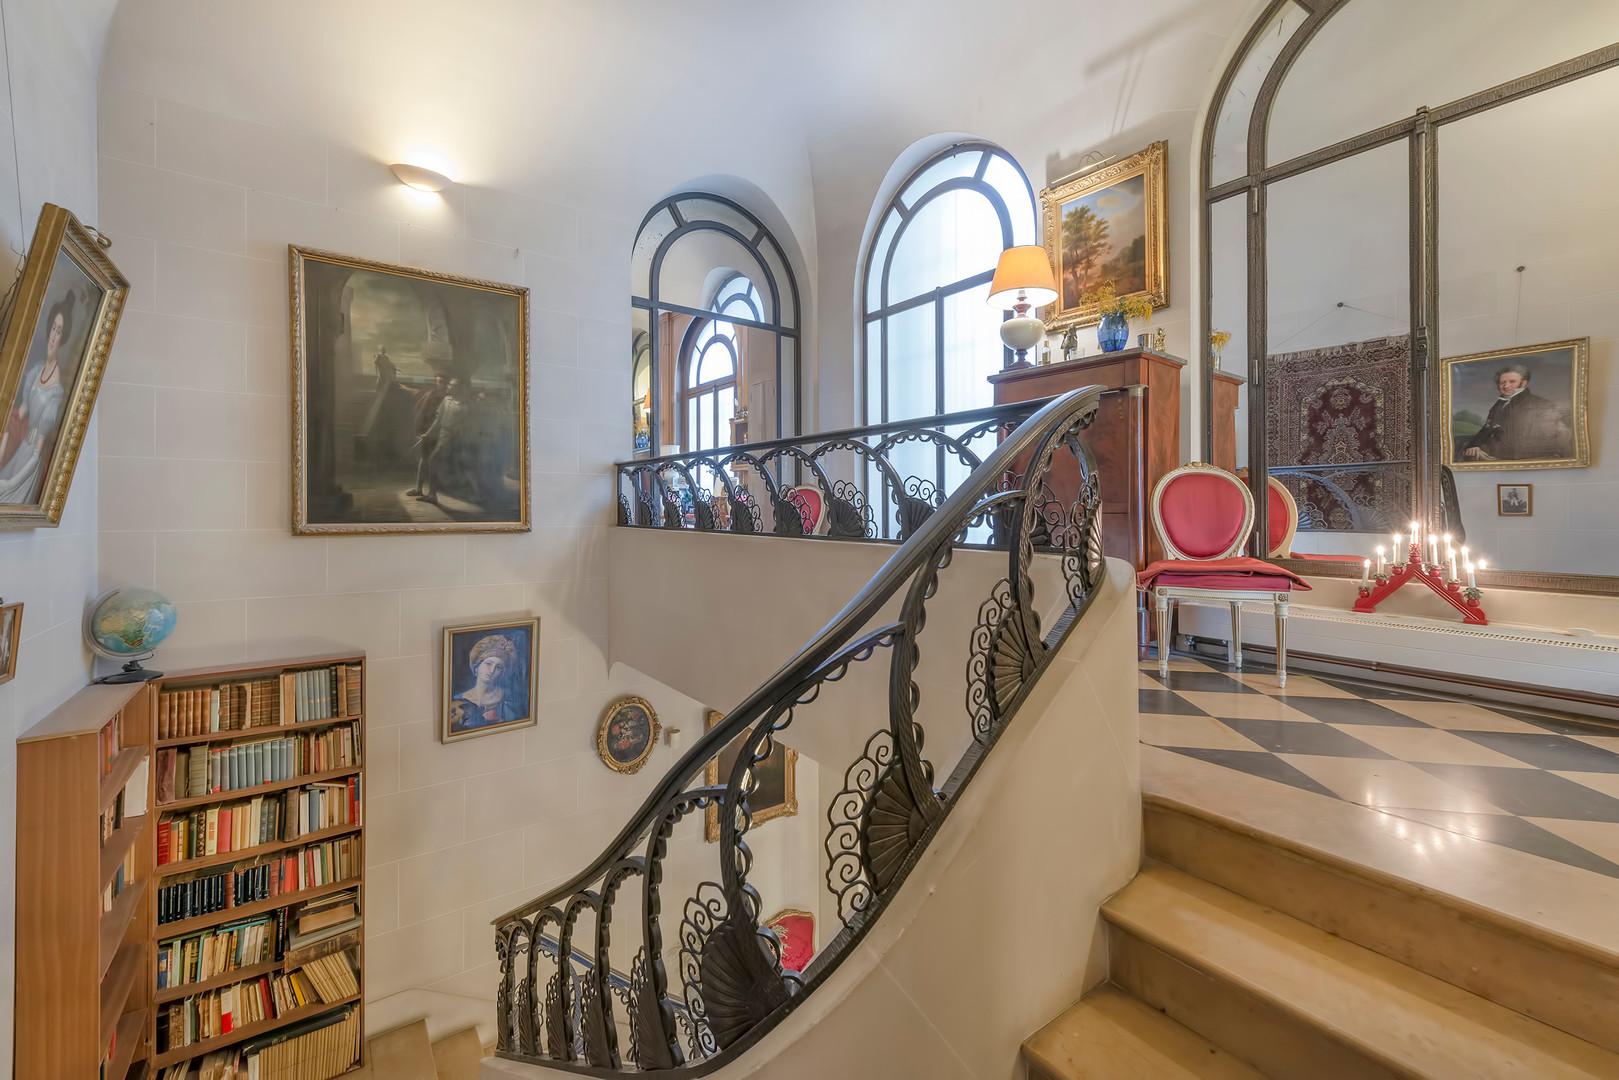 8 escalier.jpg